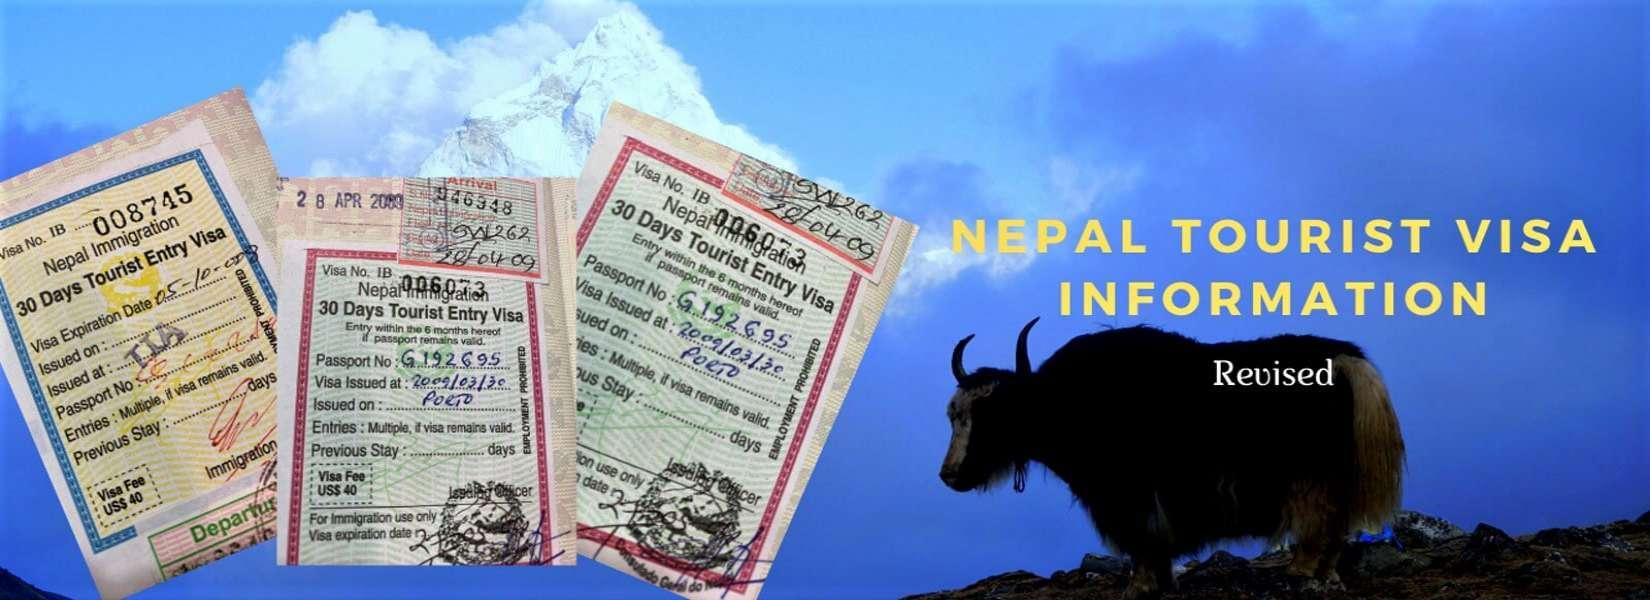 Nepal Tourist Visa Information